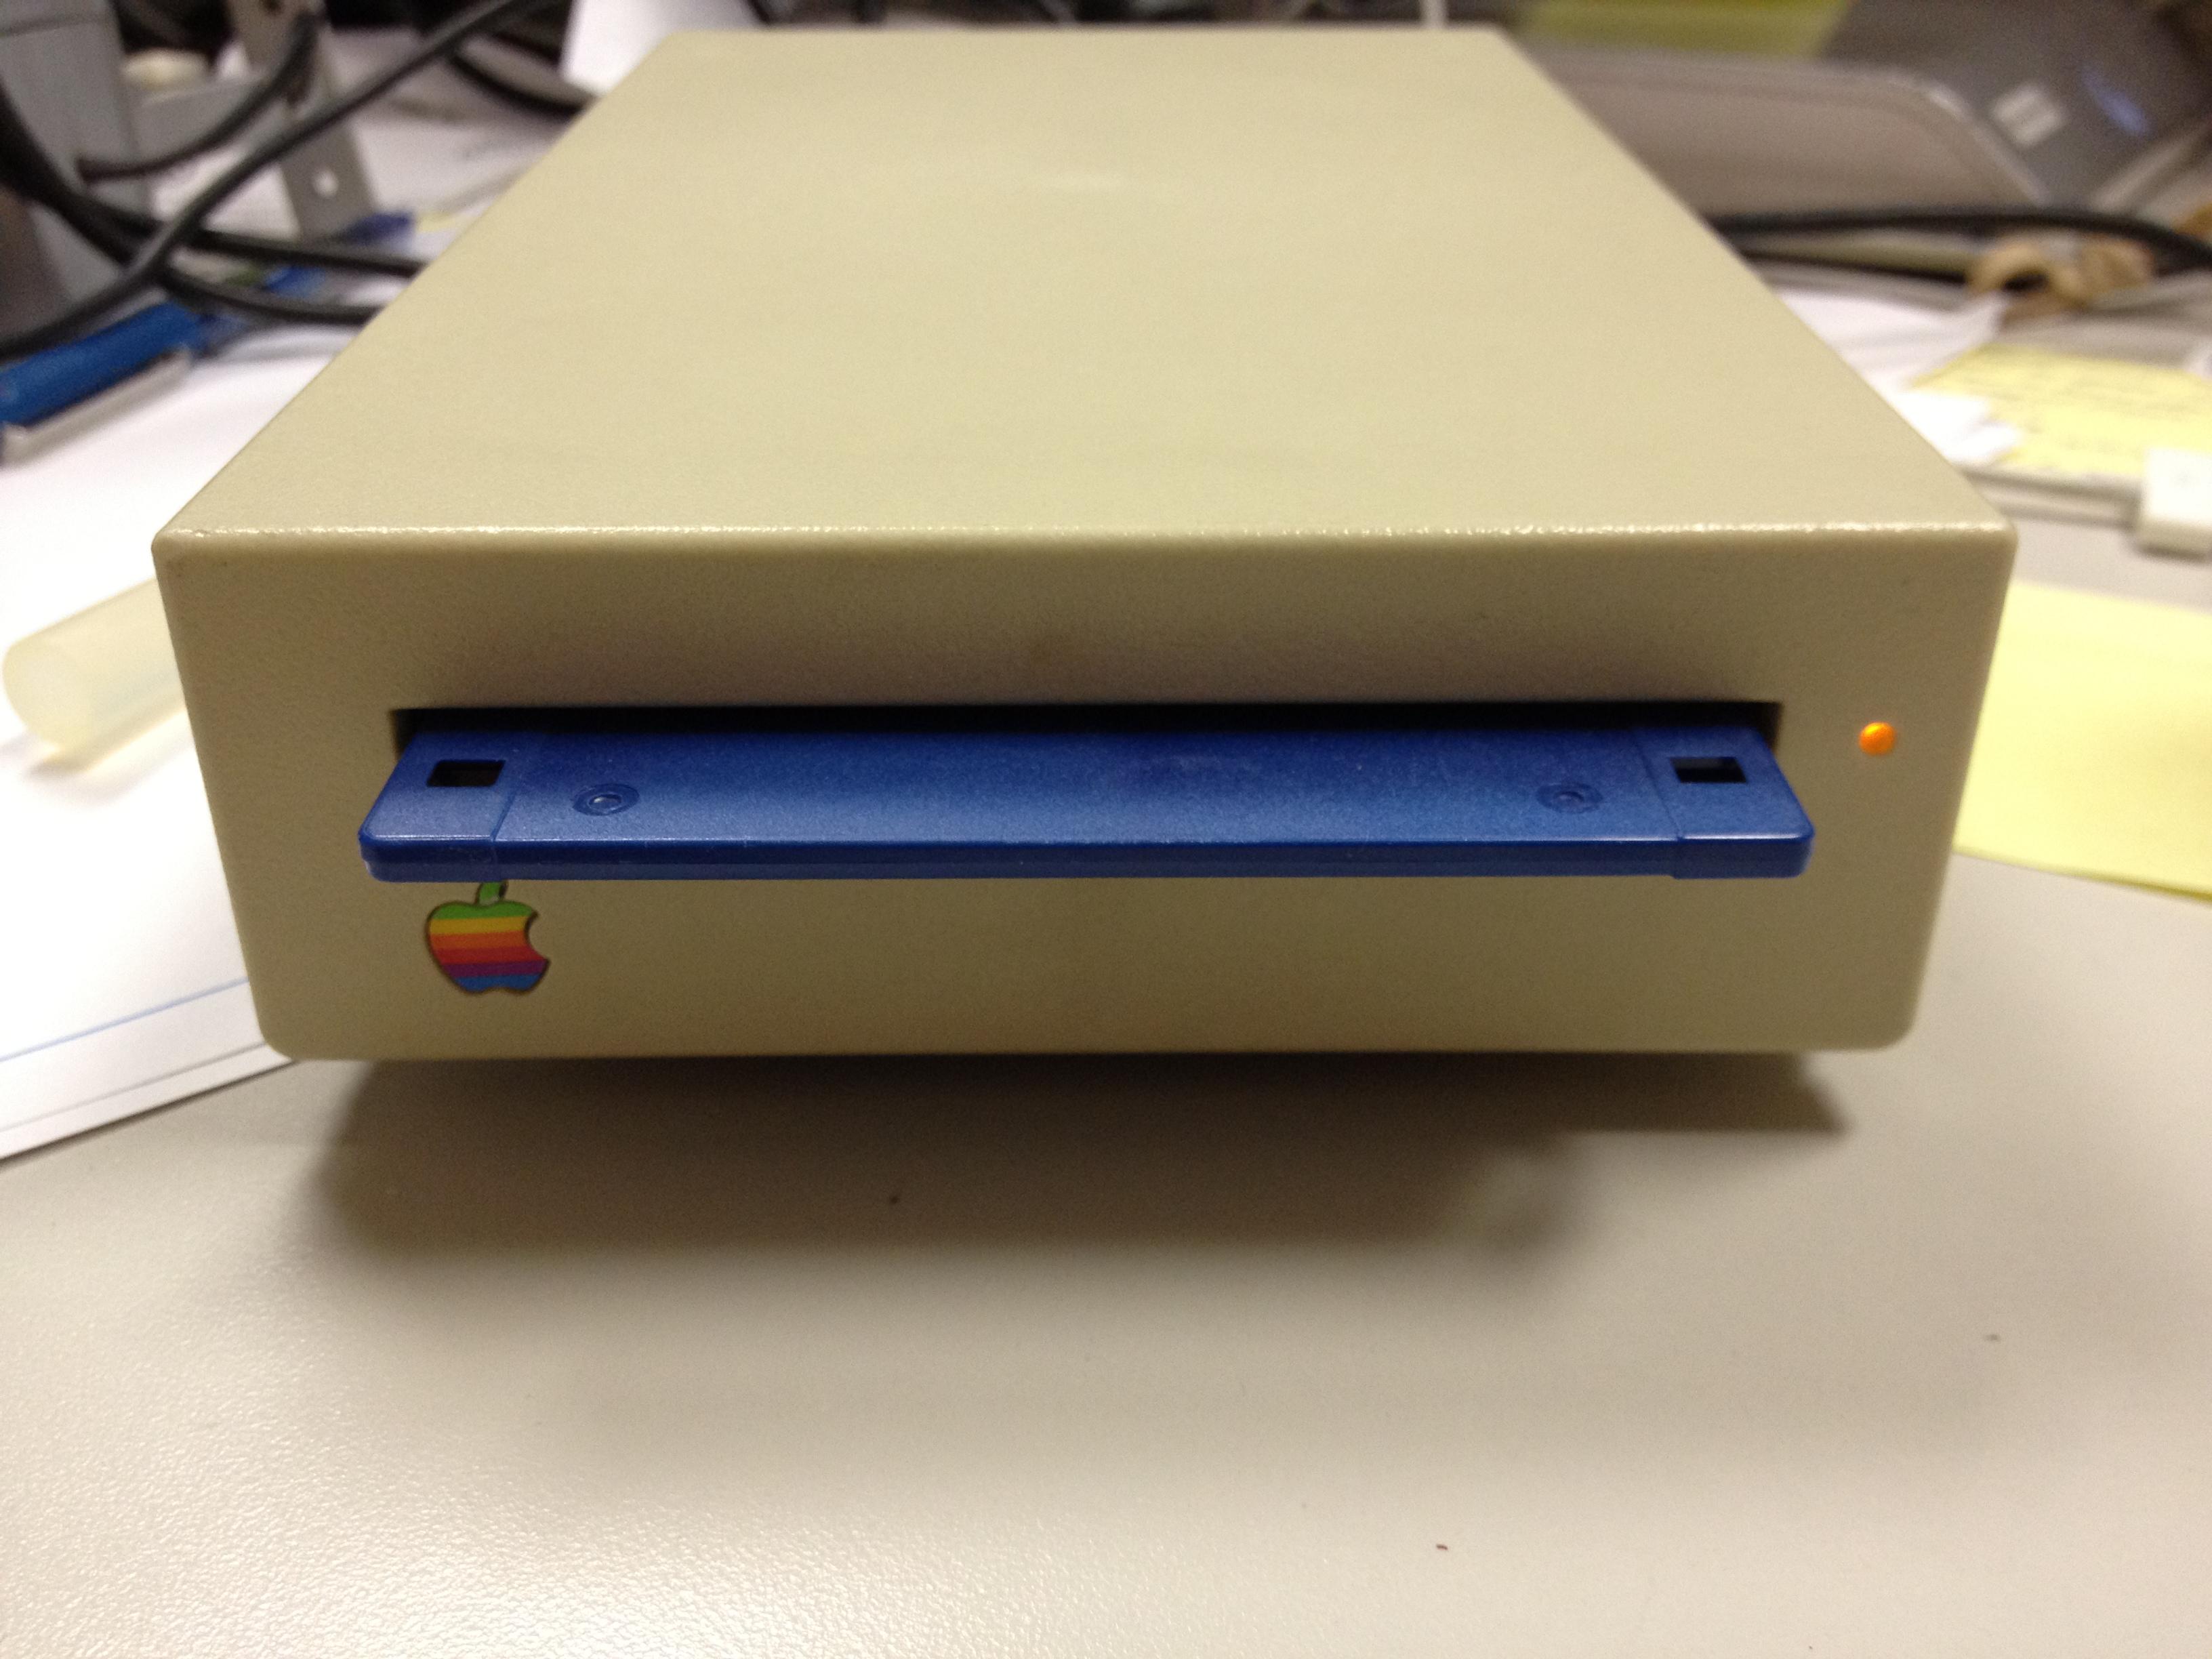 Retro Apple Disk Drive as HDD Enclosure